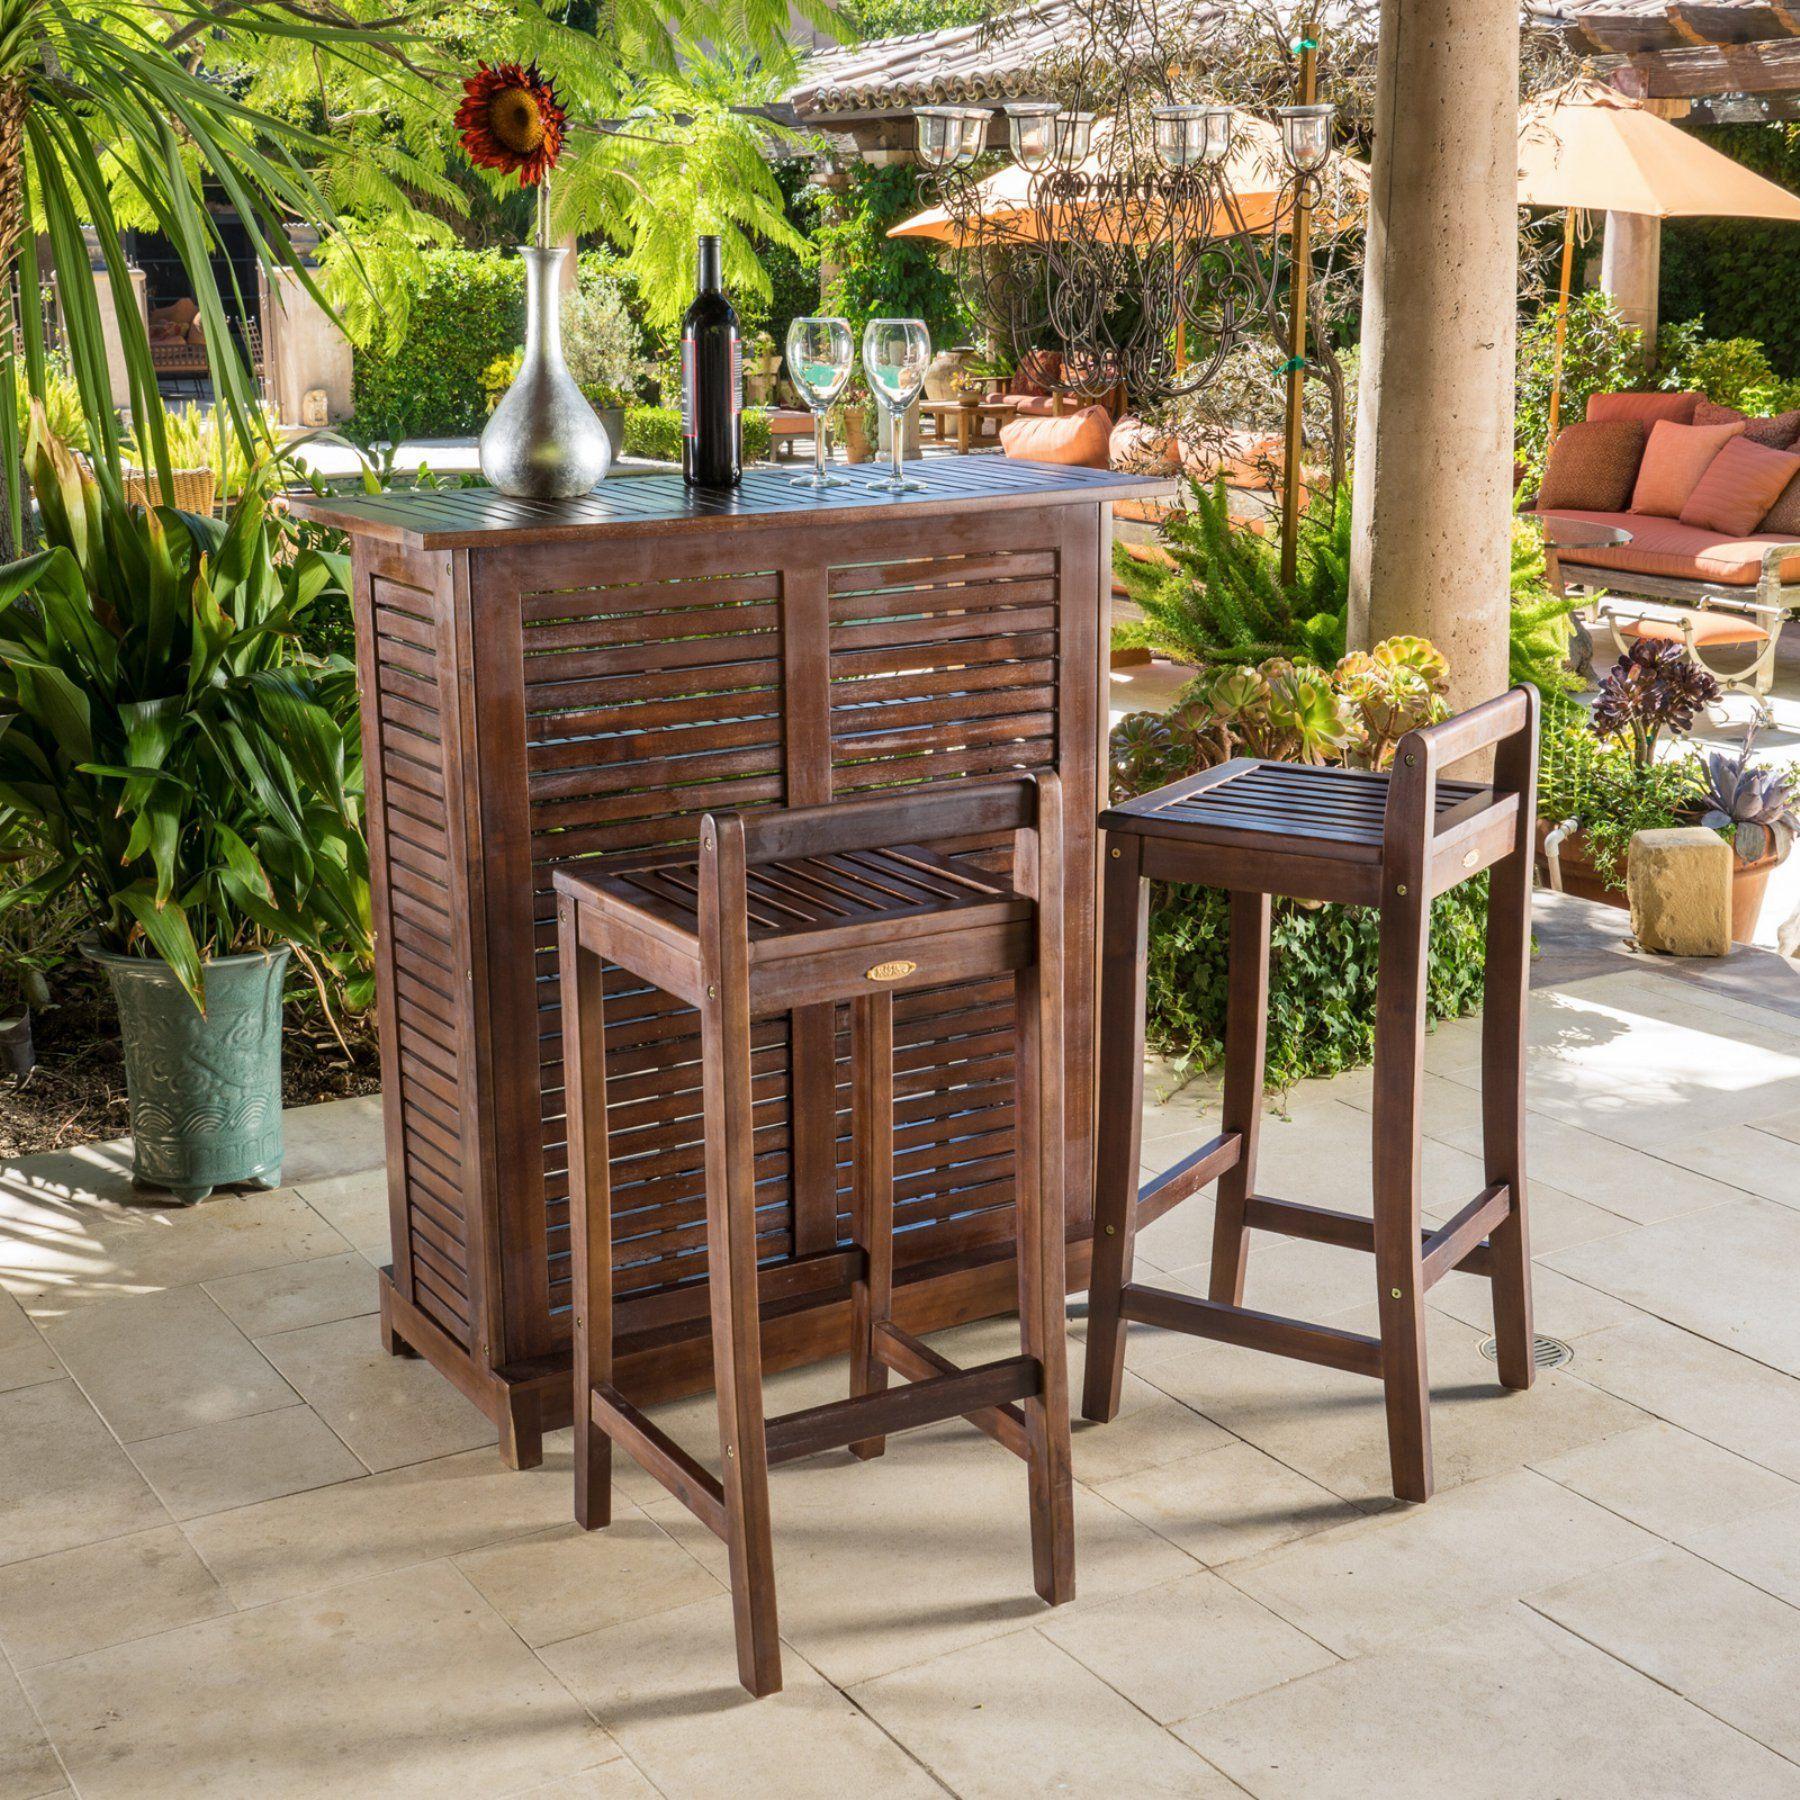 wood patio bar set. Outdoor Best Selling Home Lexi 3 Piece Bar Set - 295353 Wood Patio